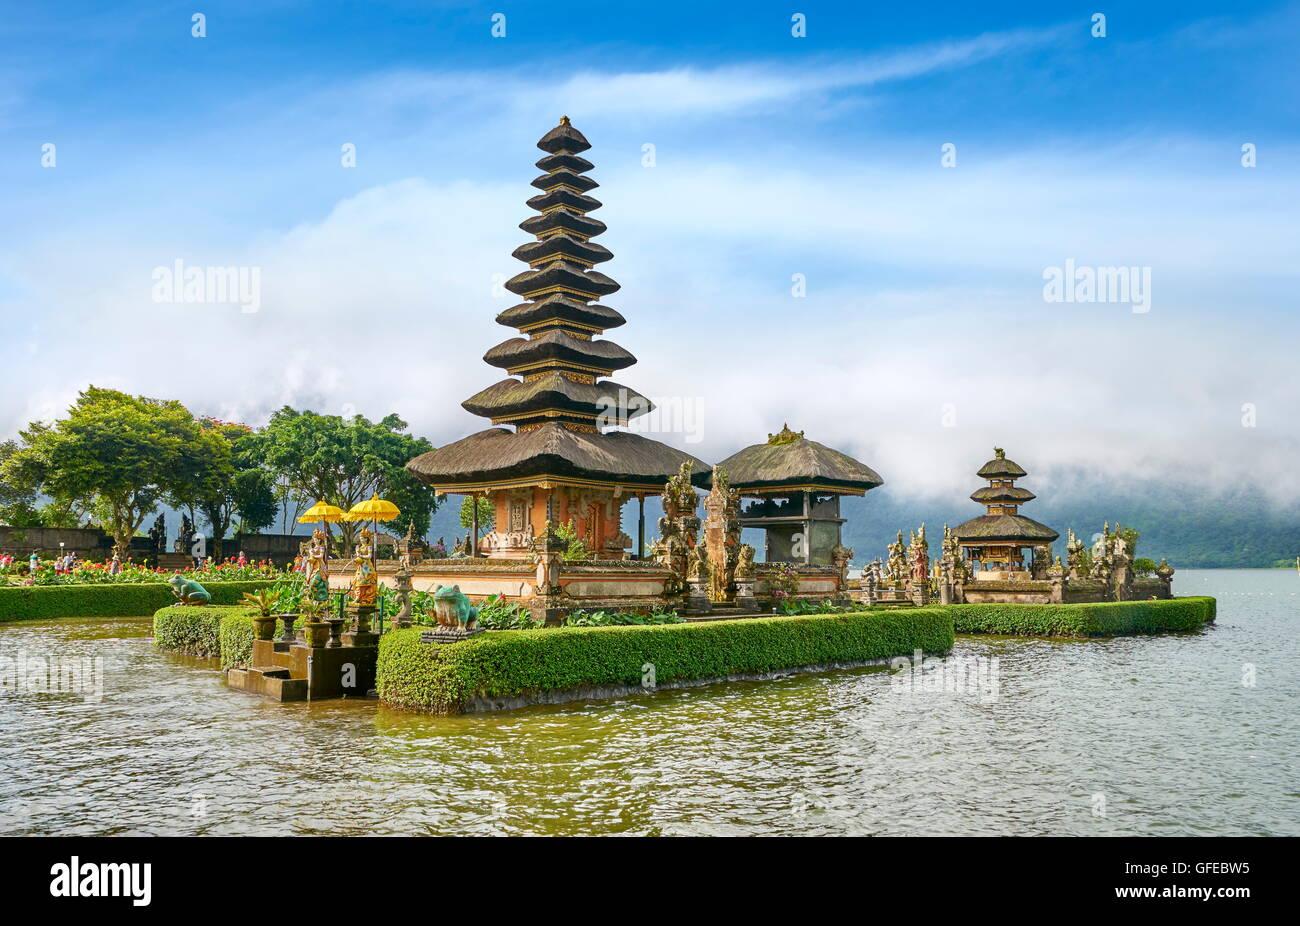 Pura Ulun Danu Bratan Templo en el lago, Bali, Indonesia Imagen De Stock